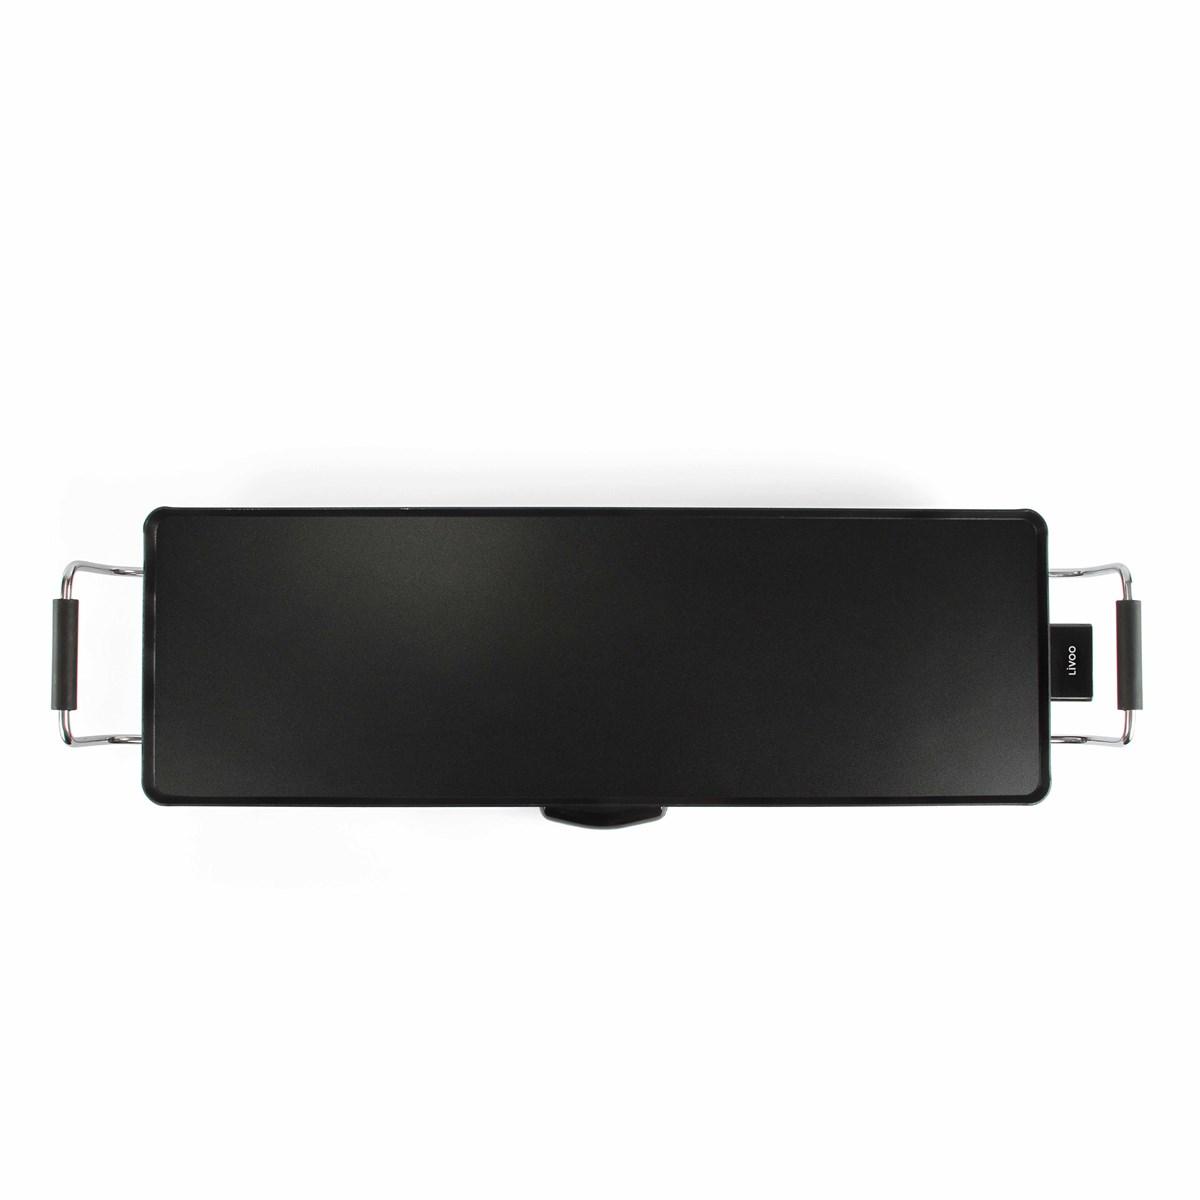 Plancha Teppan Yaki grill 90 cm en métal noir